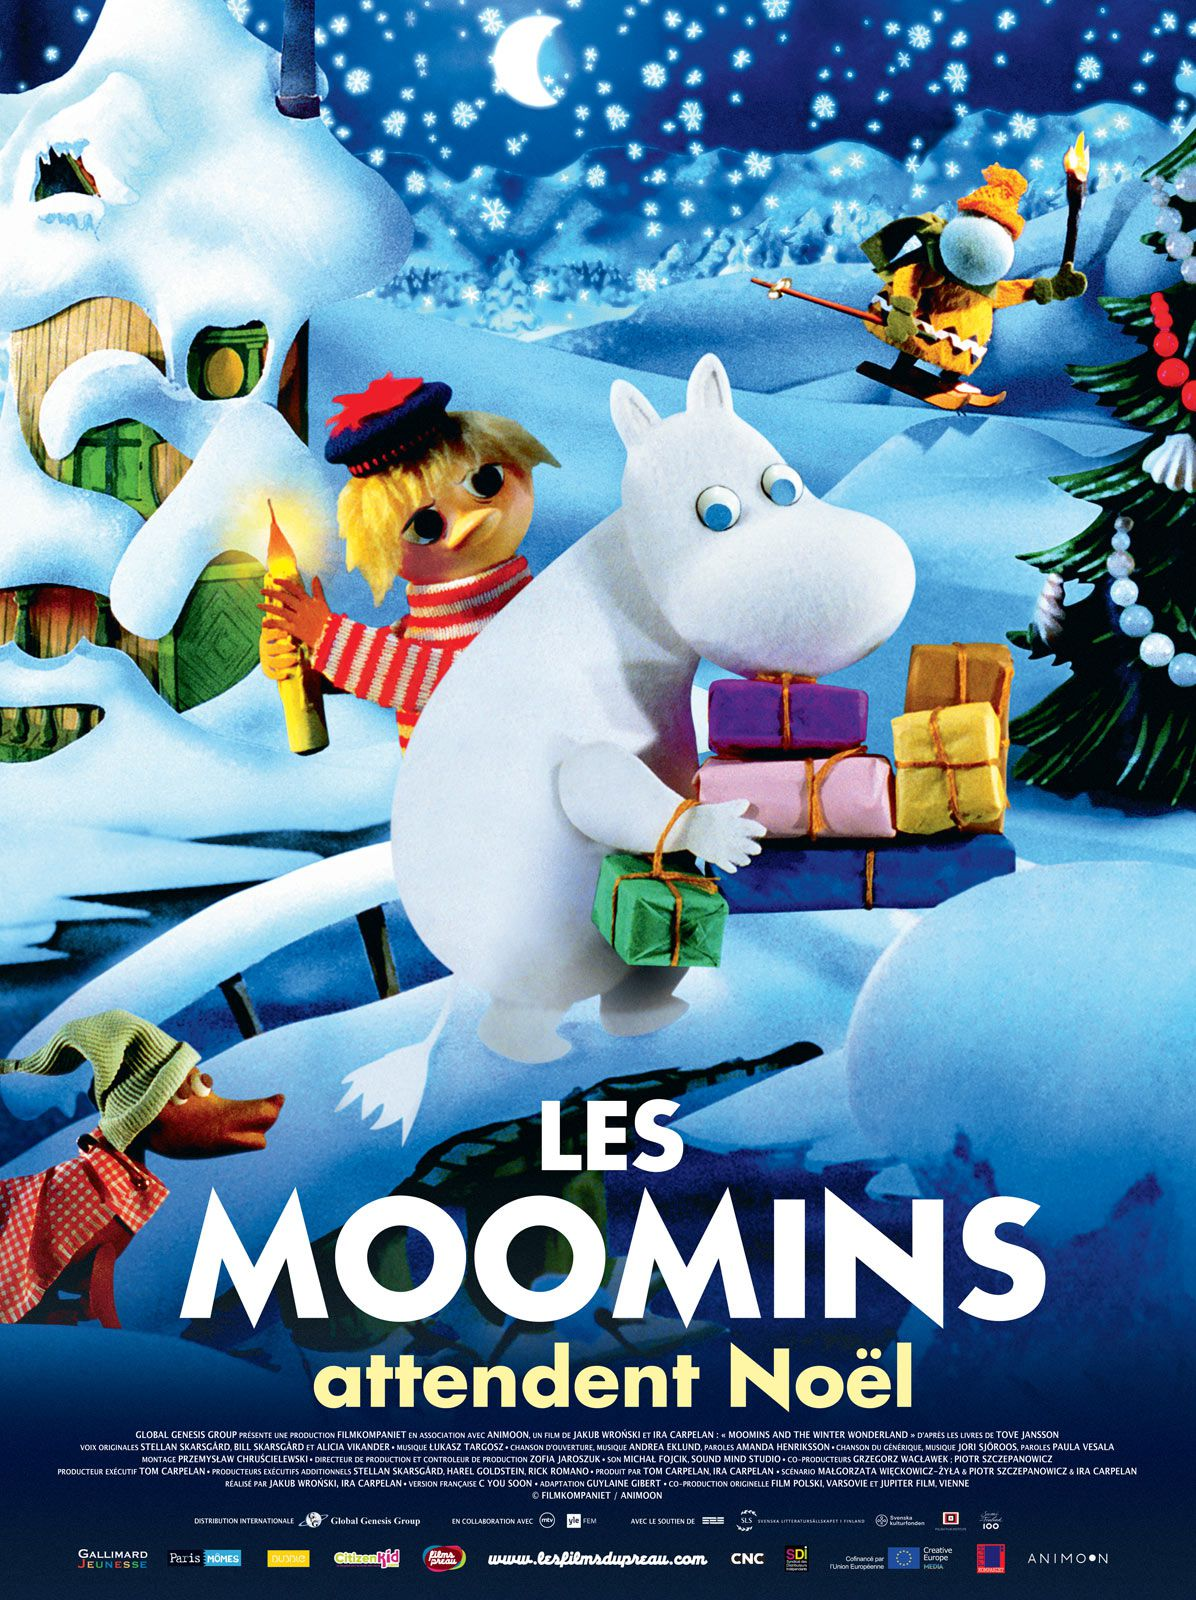 Les Moomins attendent Noël - Long-métrage d'animation (2017)